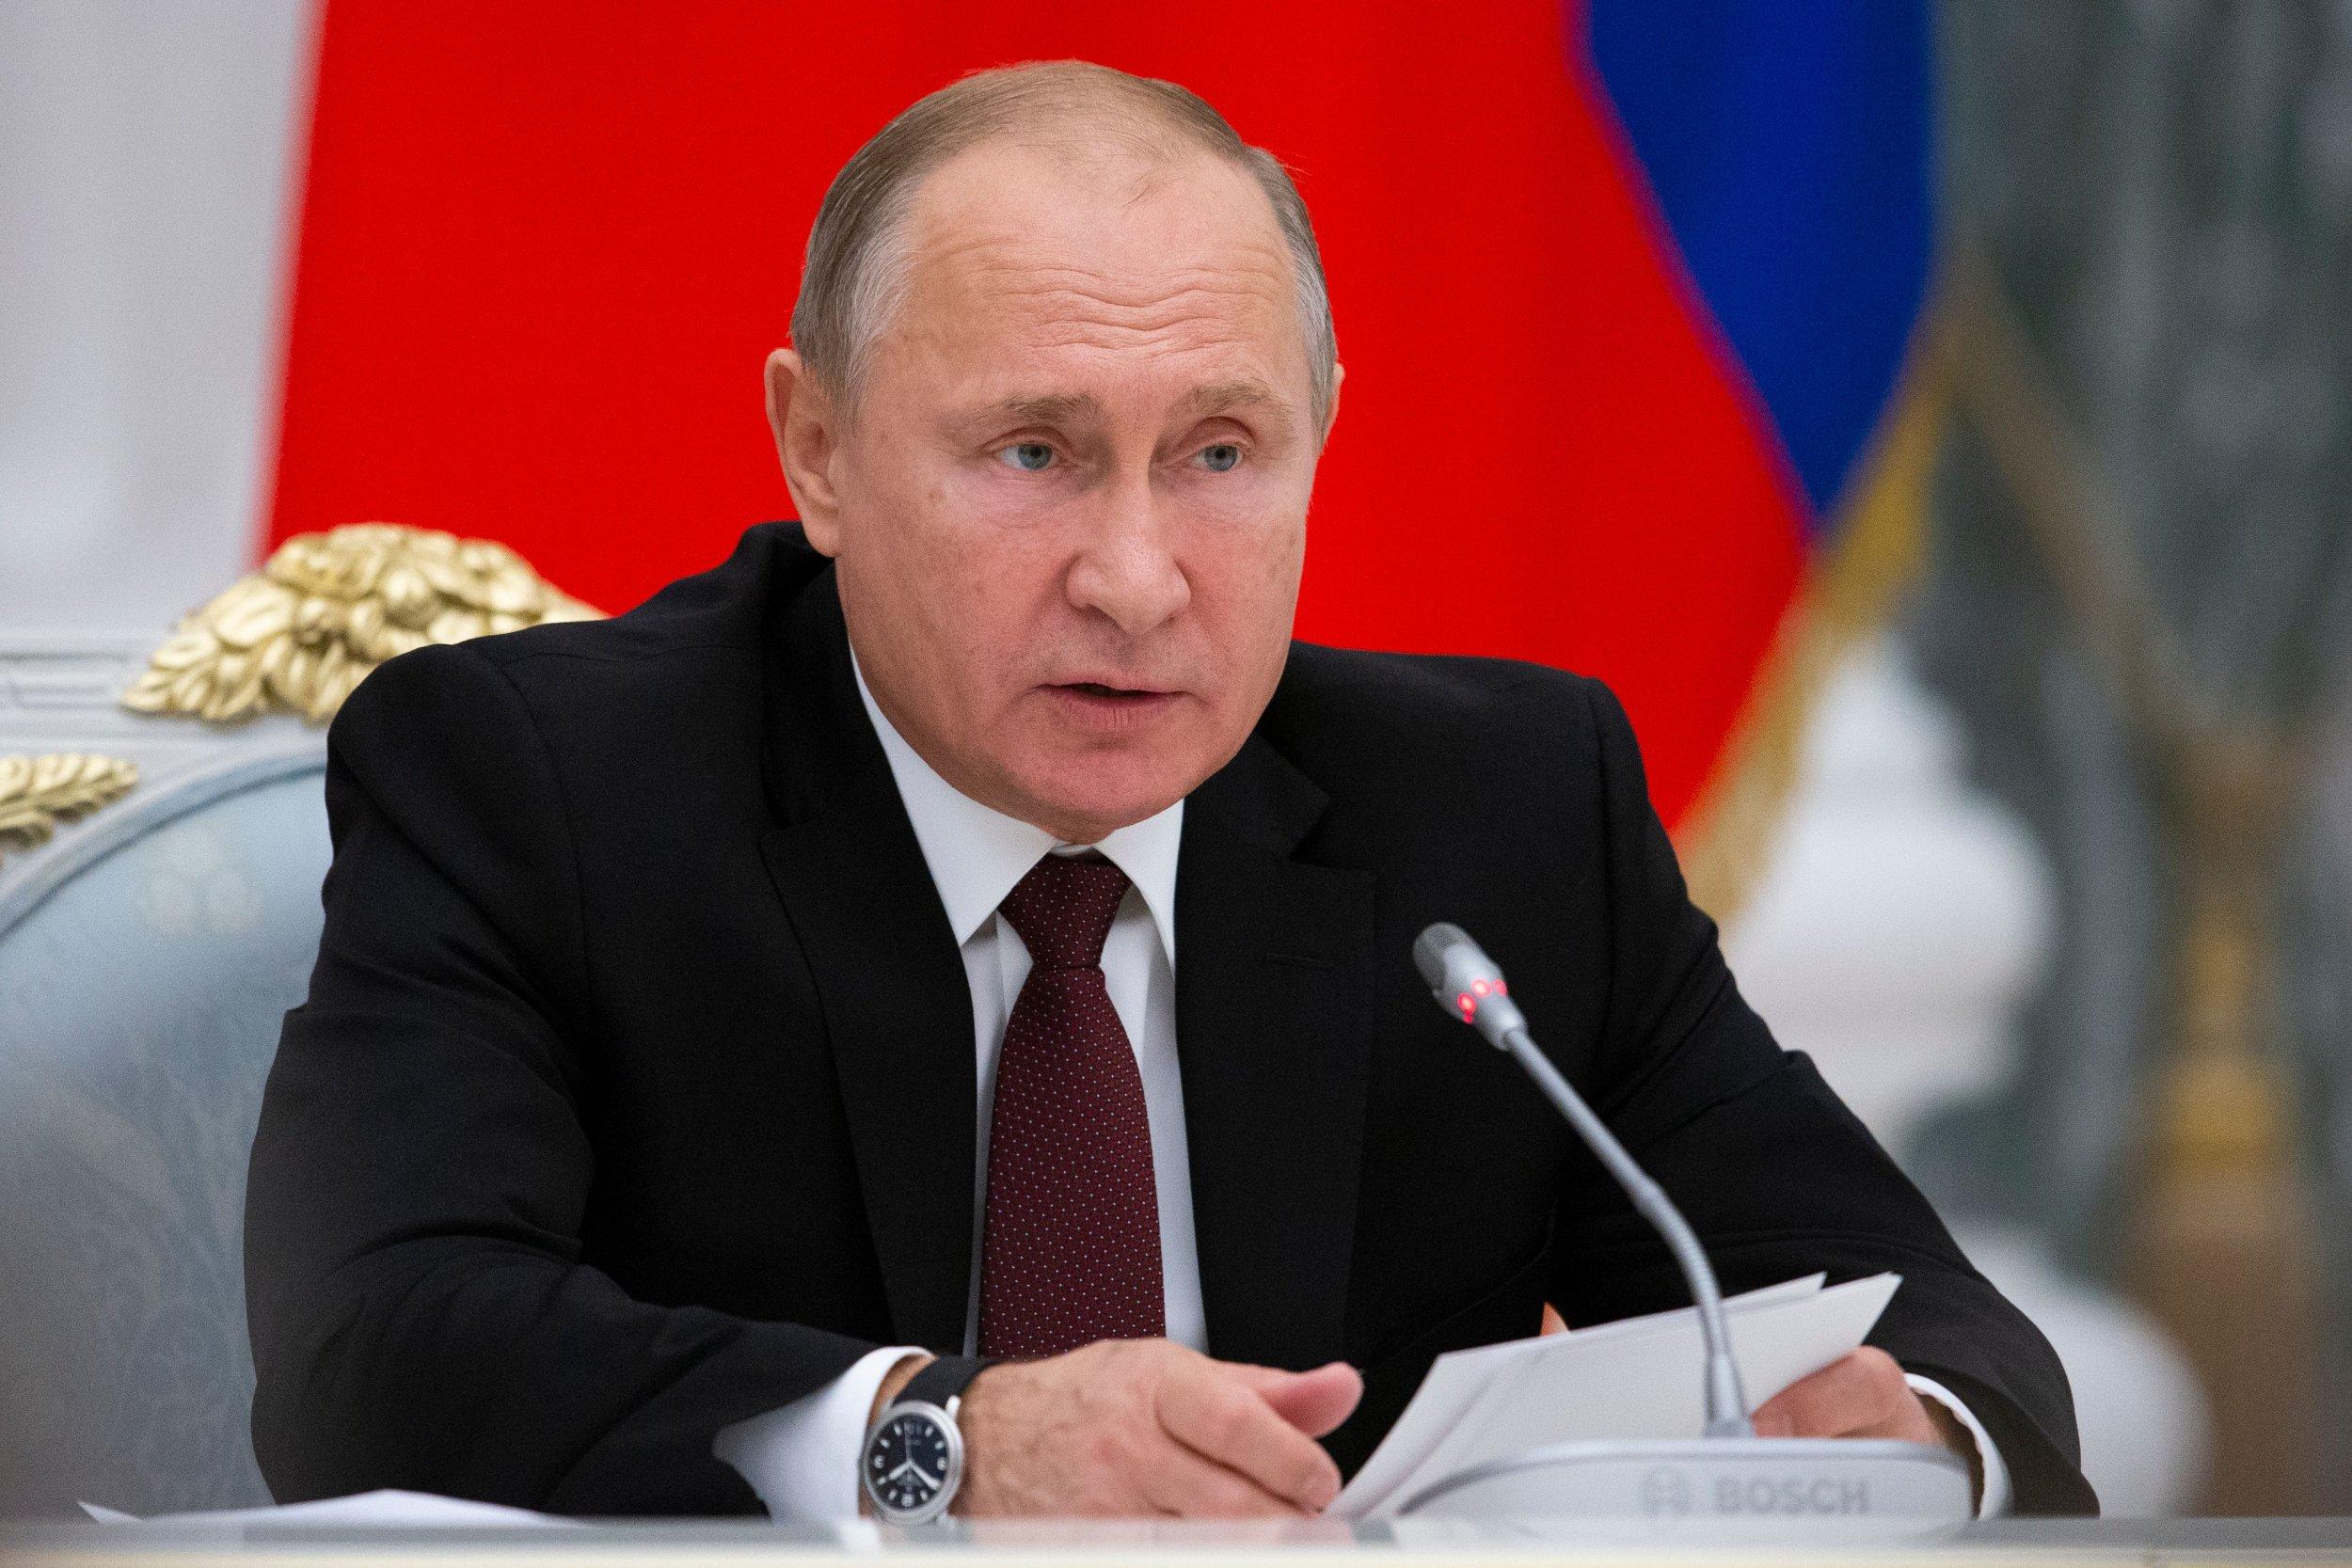 Vladimir Putin nuclear weapons missiles Europe